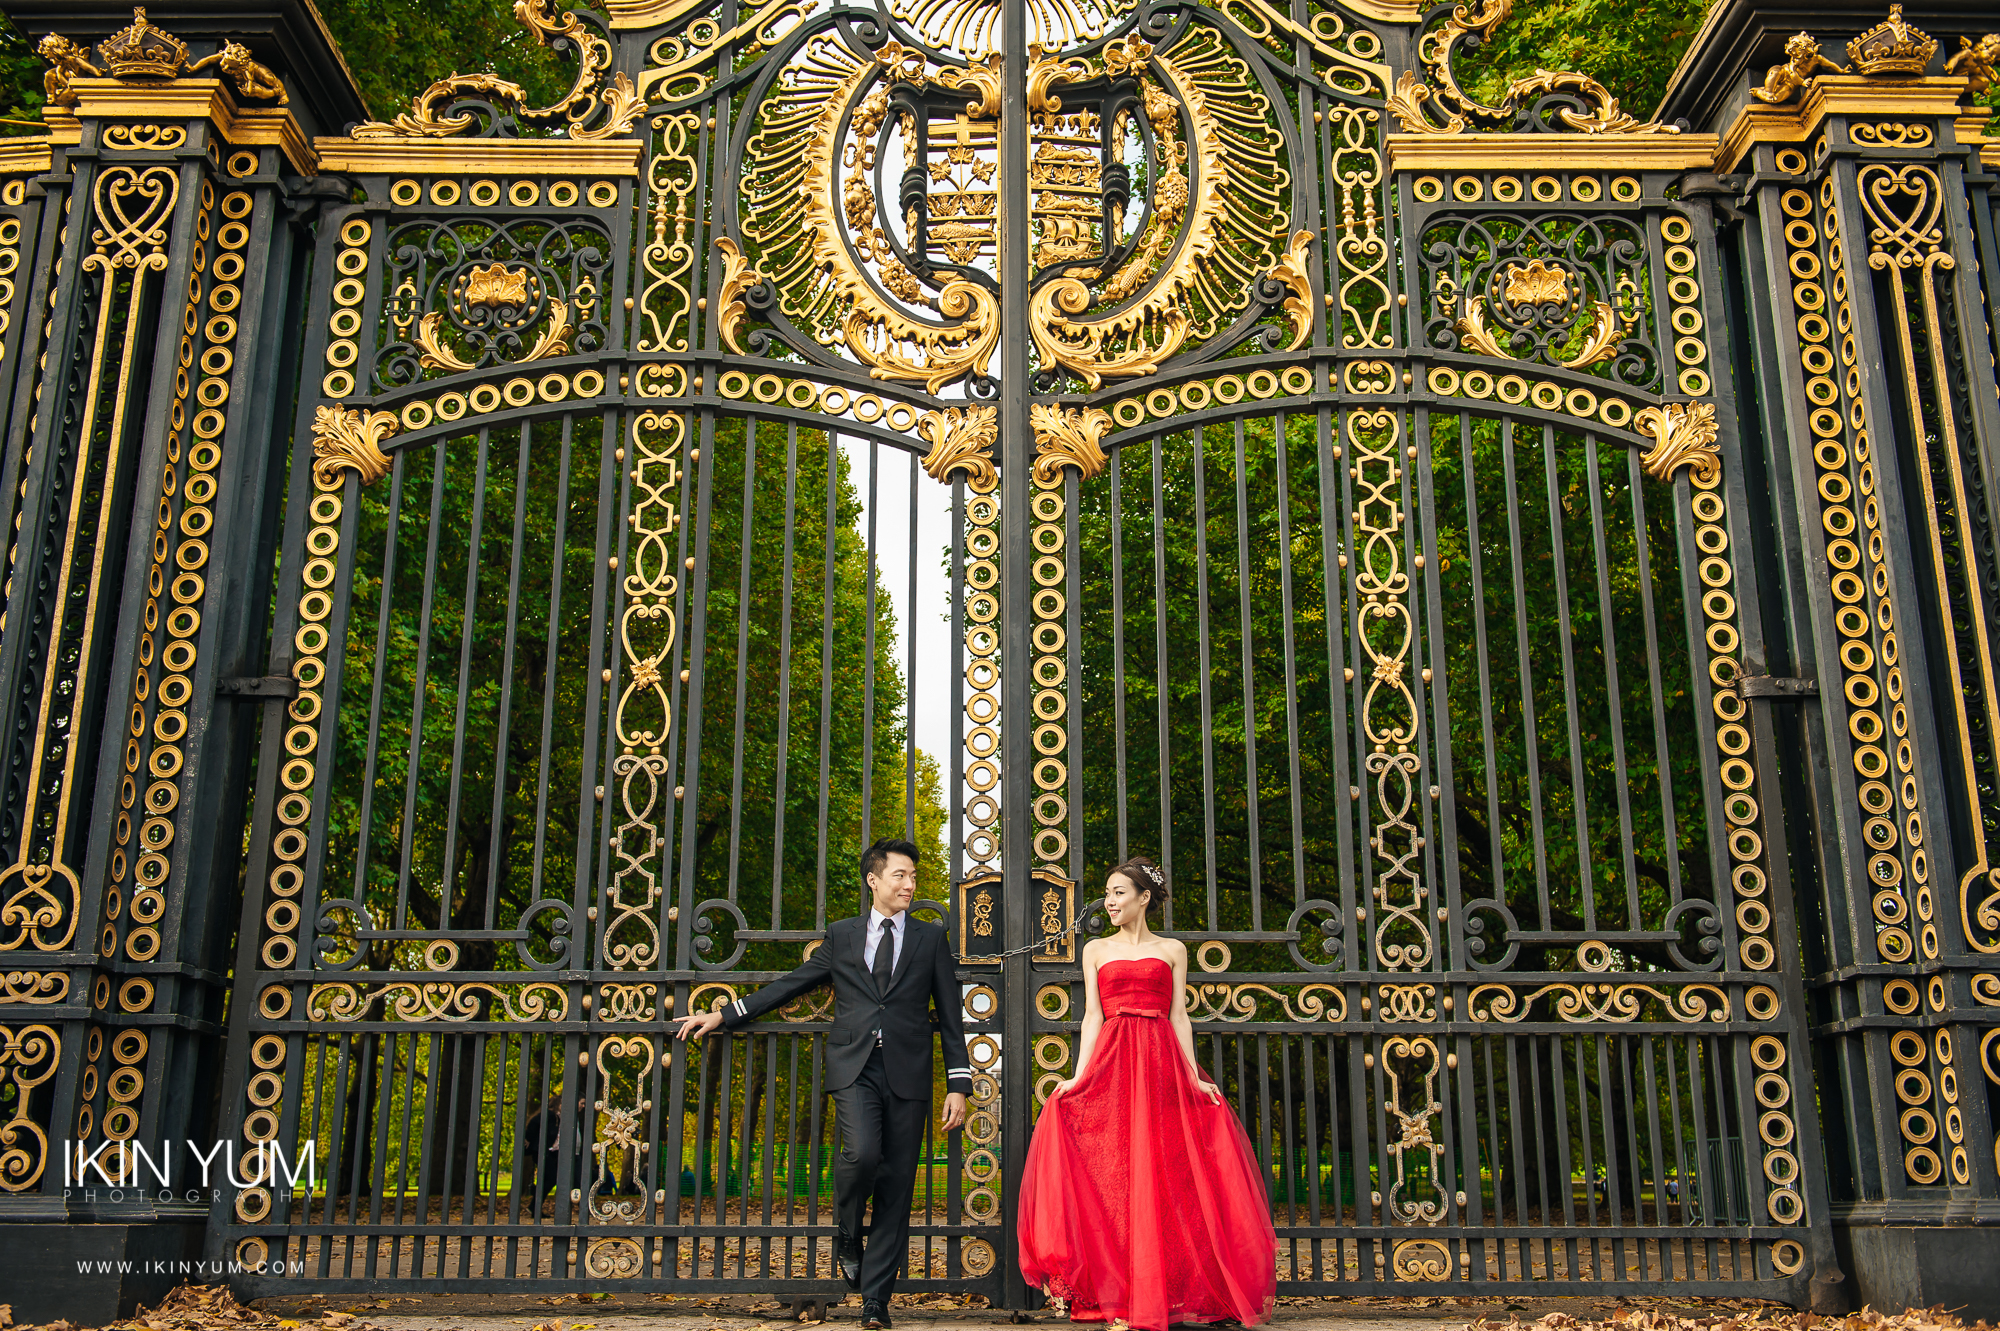 Yannis & Kenny Pre-Wedding Shoot - Ikin Yum Photography-0137.jpg